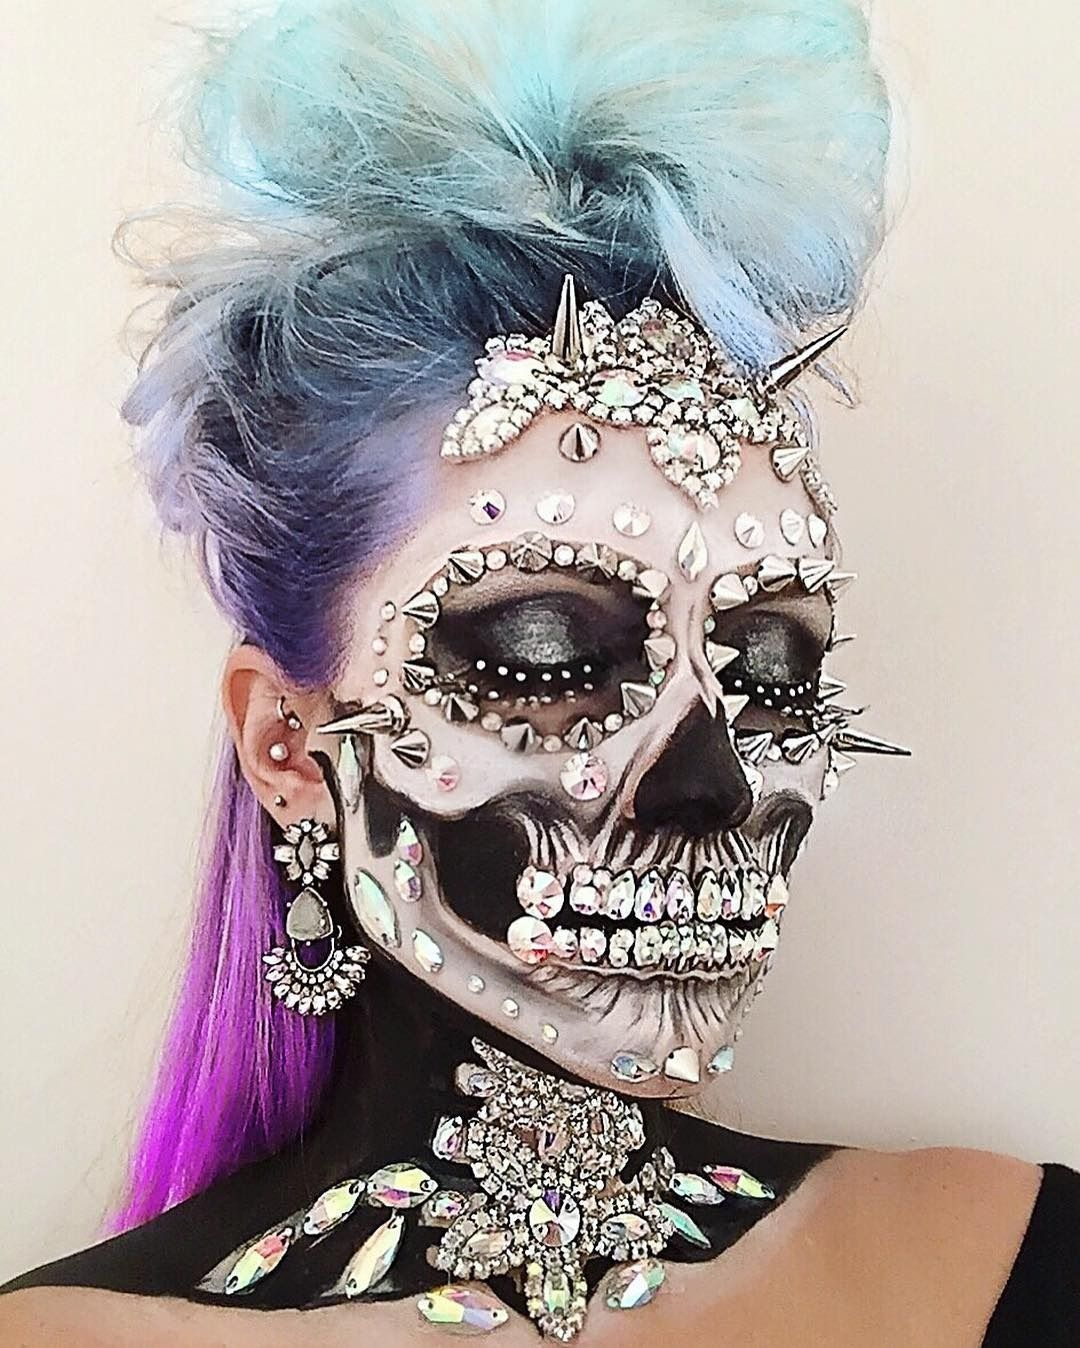 This Mua S Insane Skeleton Creations